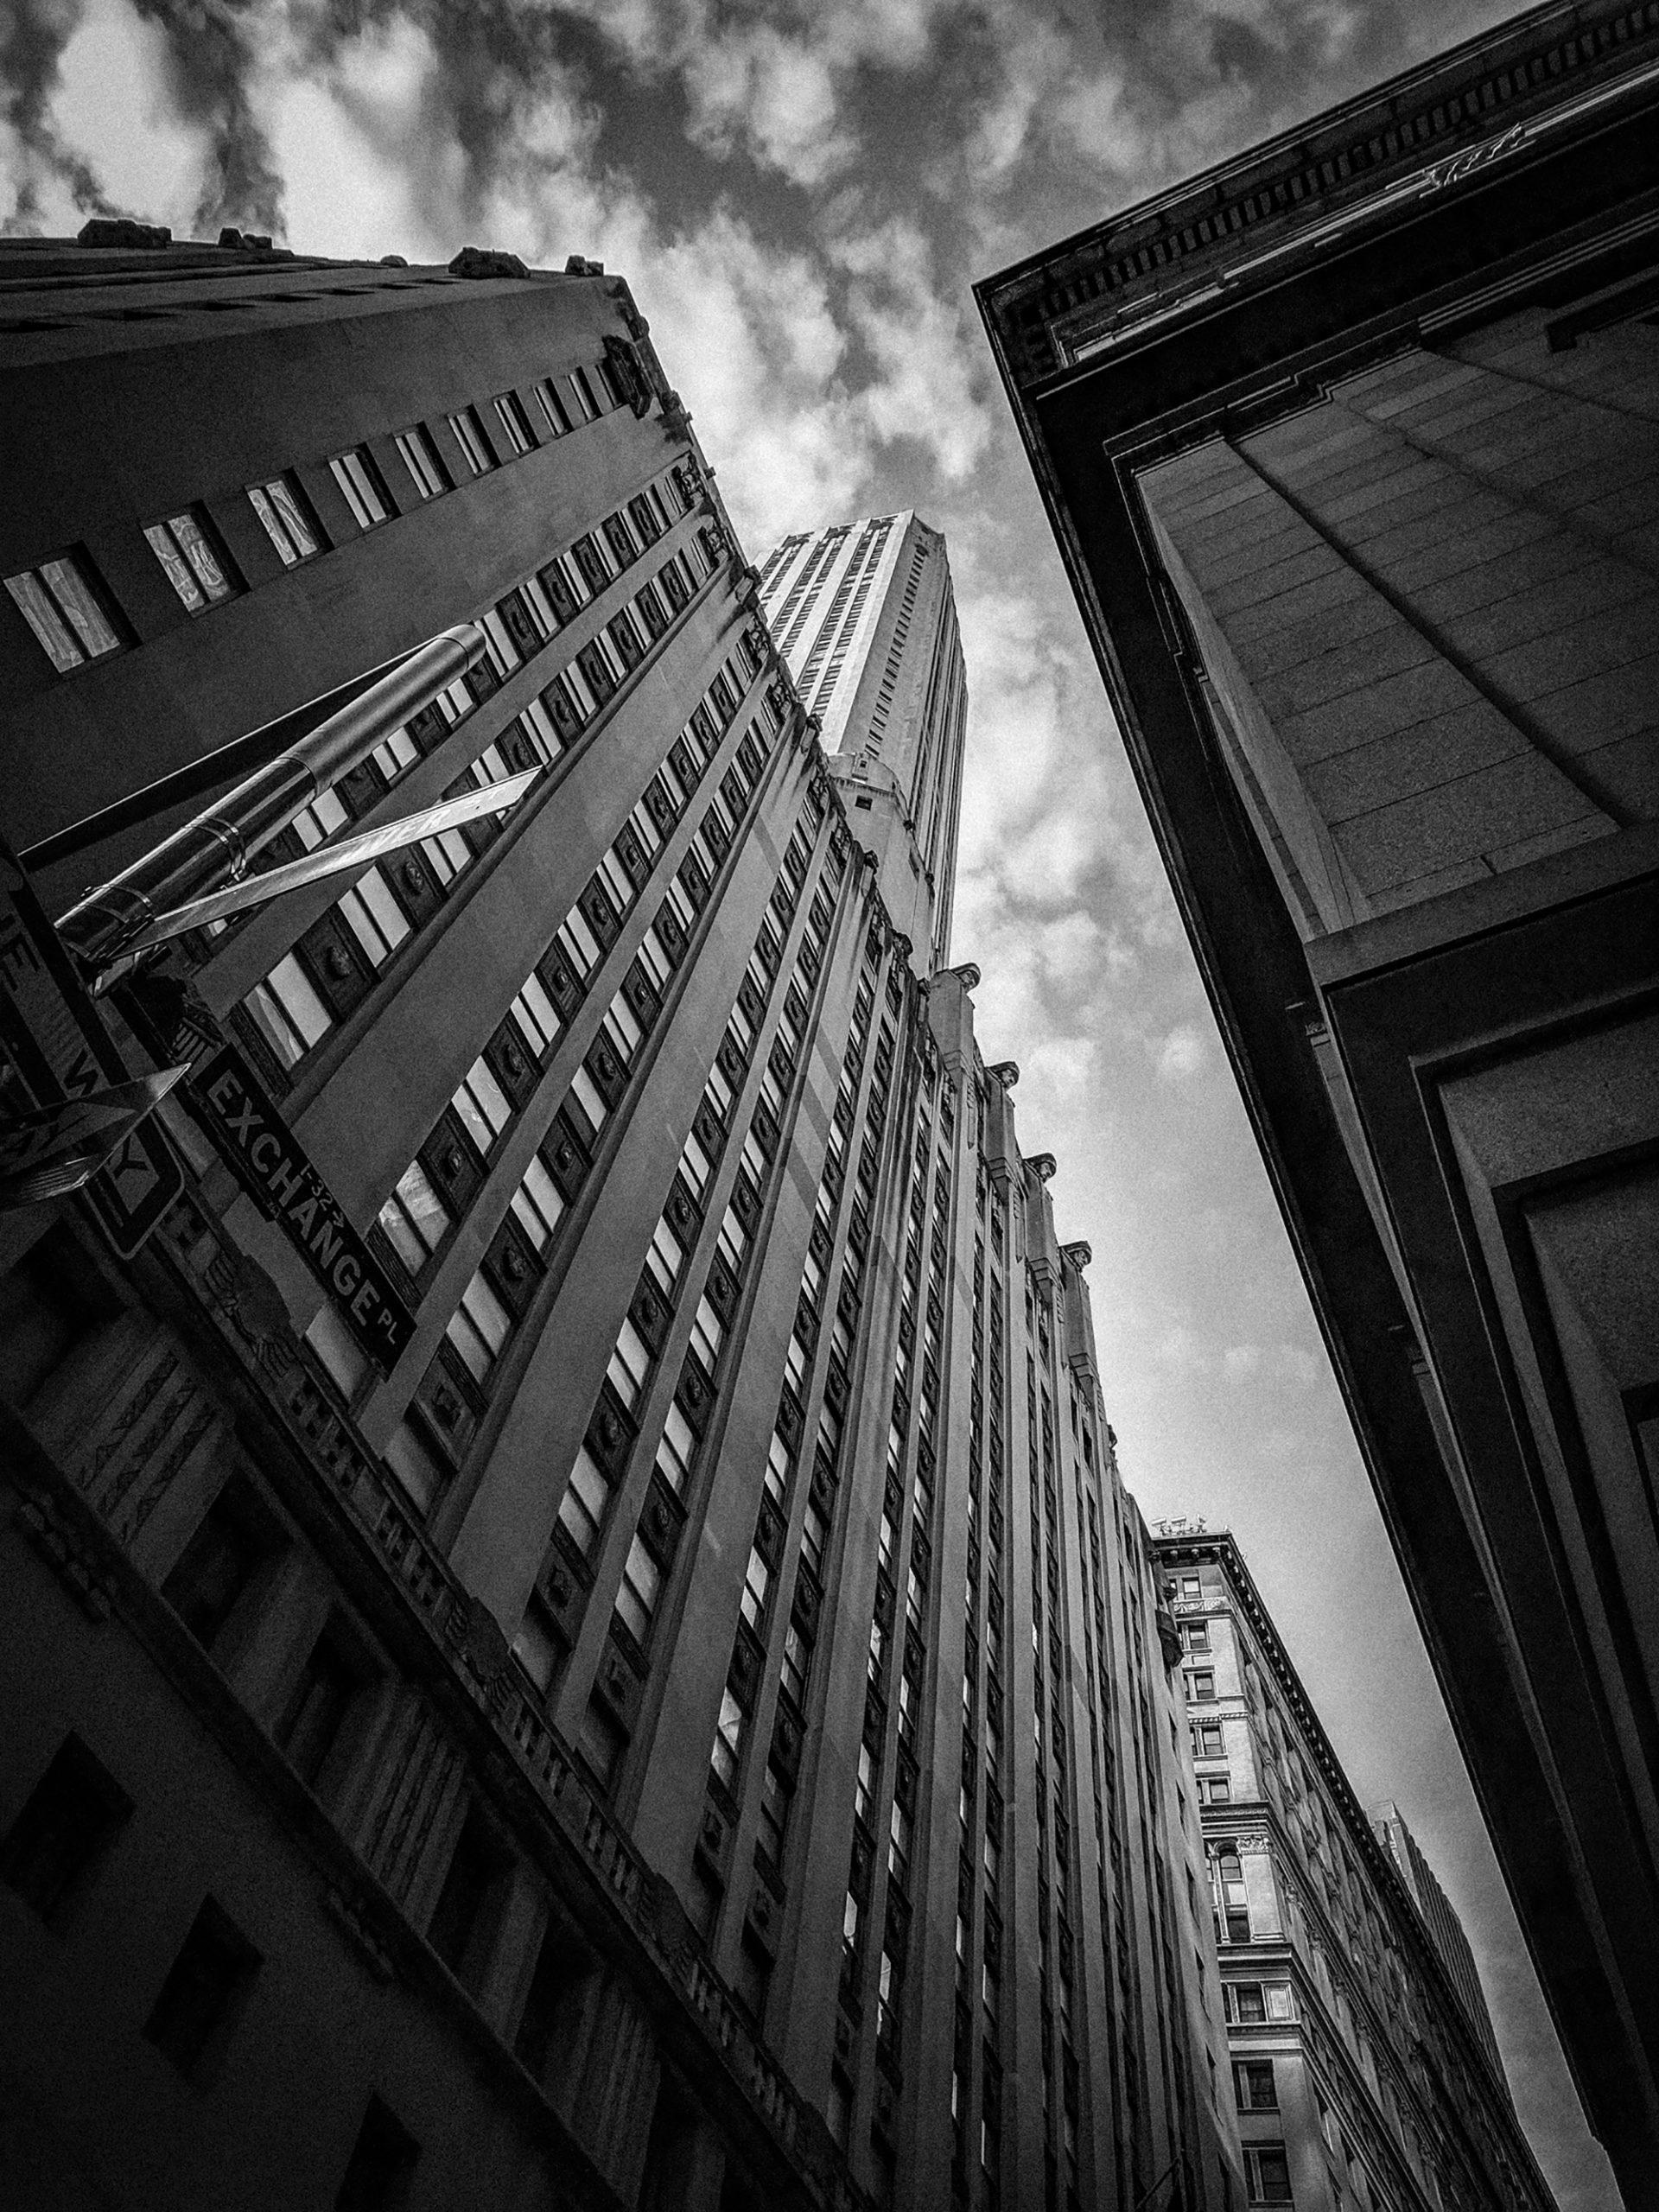 Benjamin Oliver: New York City. 8x10 inches, signed.  @benjaminoliverphoto Click here to buy